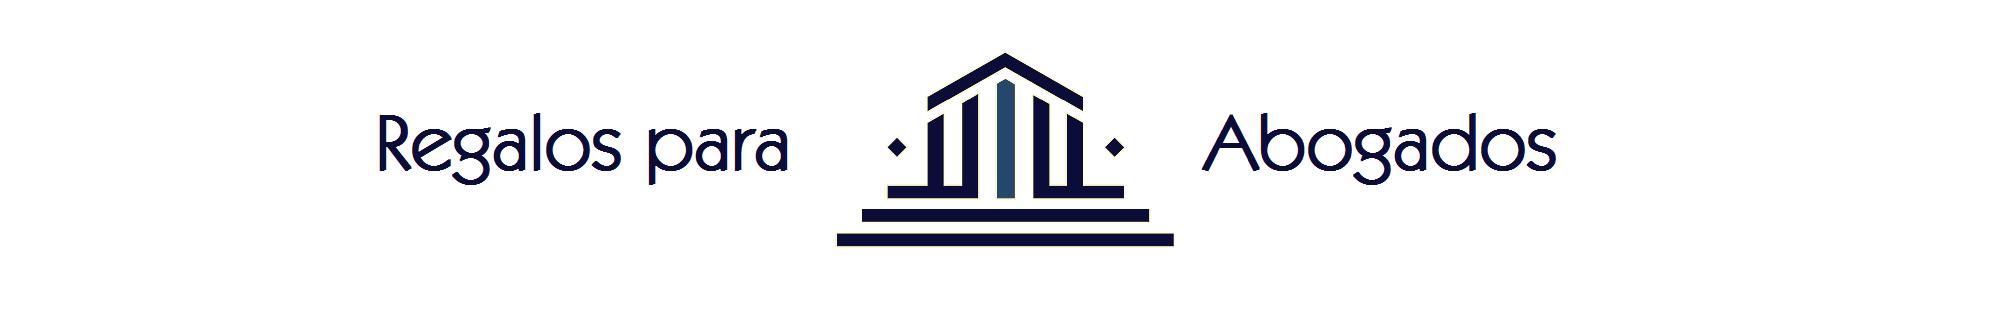 Regalos abogados abogado letrado juez fiscal procurador detalle qué regalar